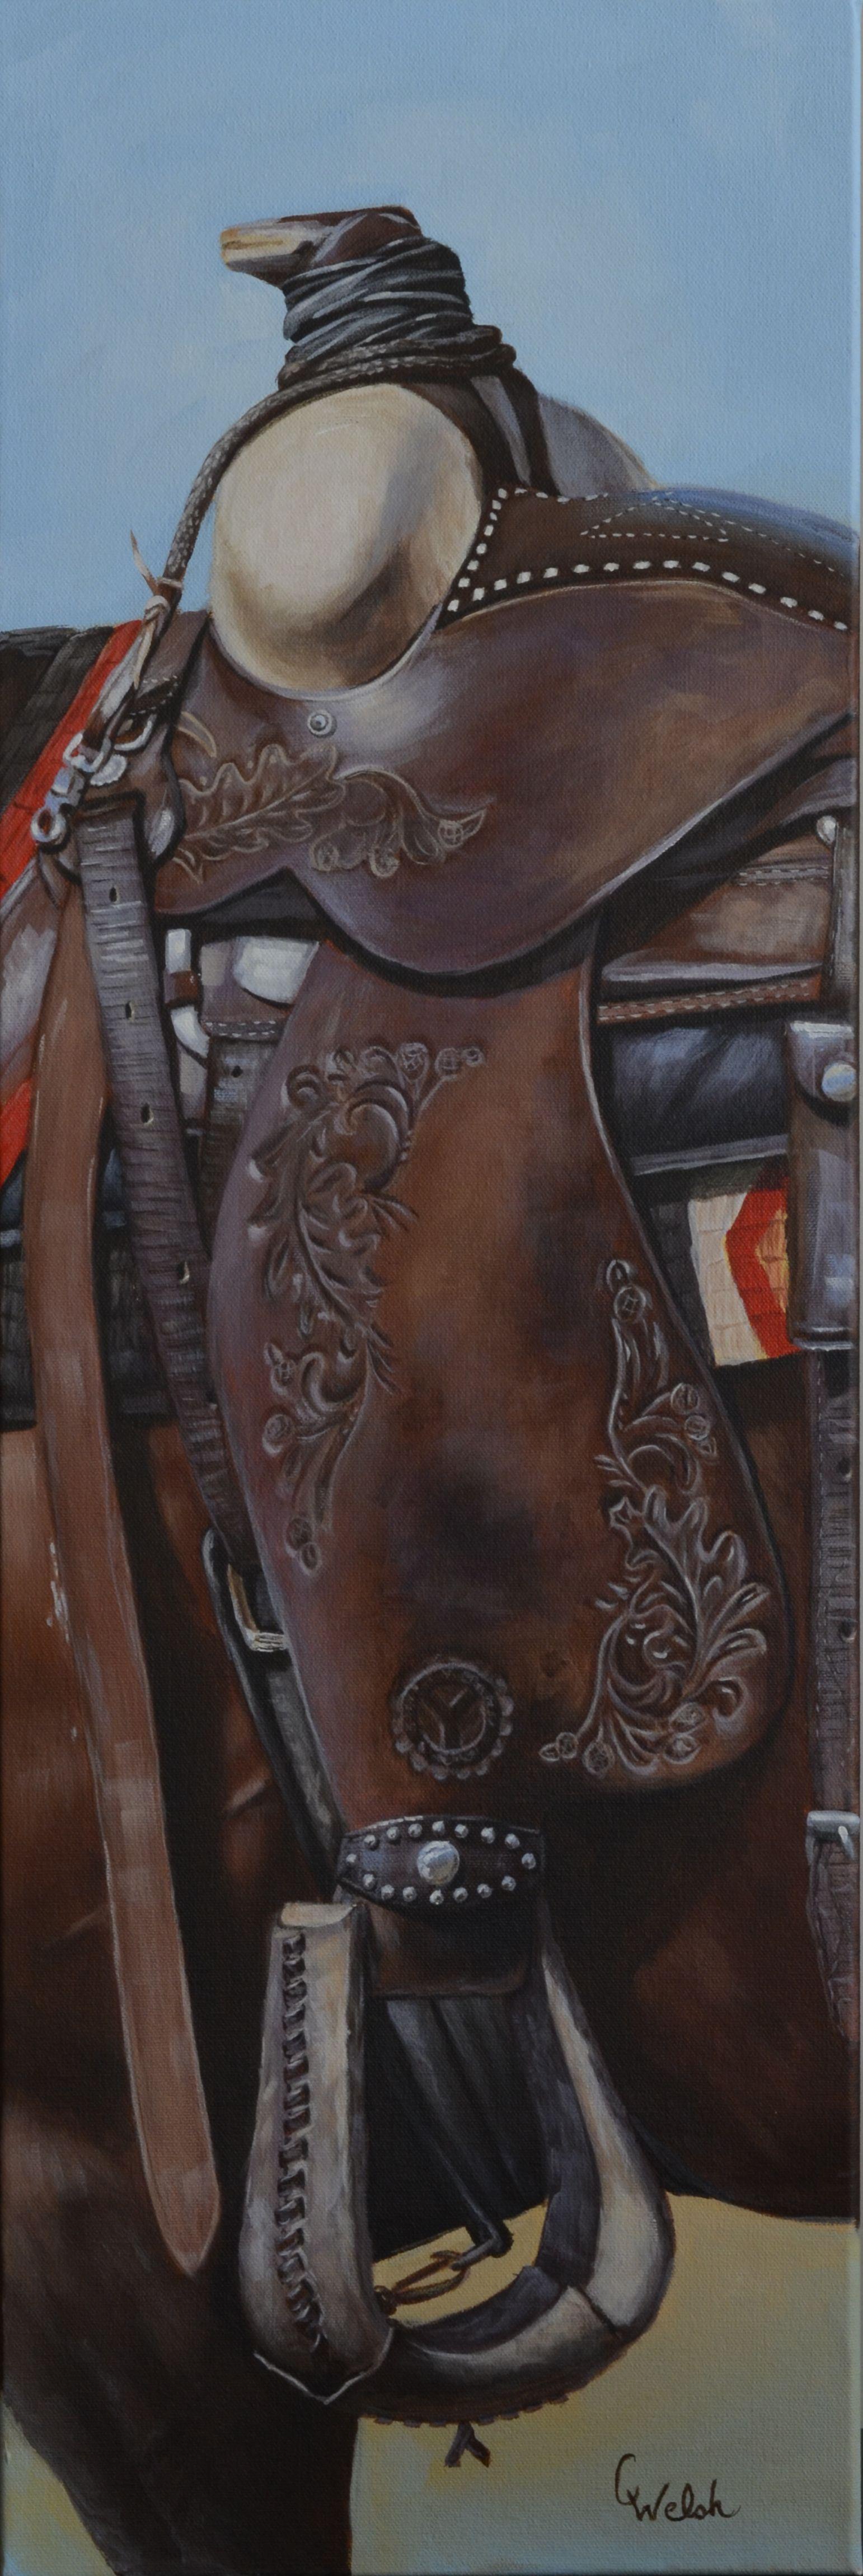 Cowboy Tack